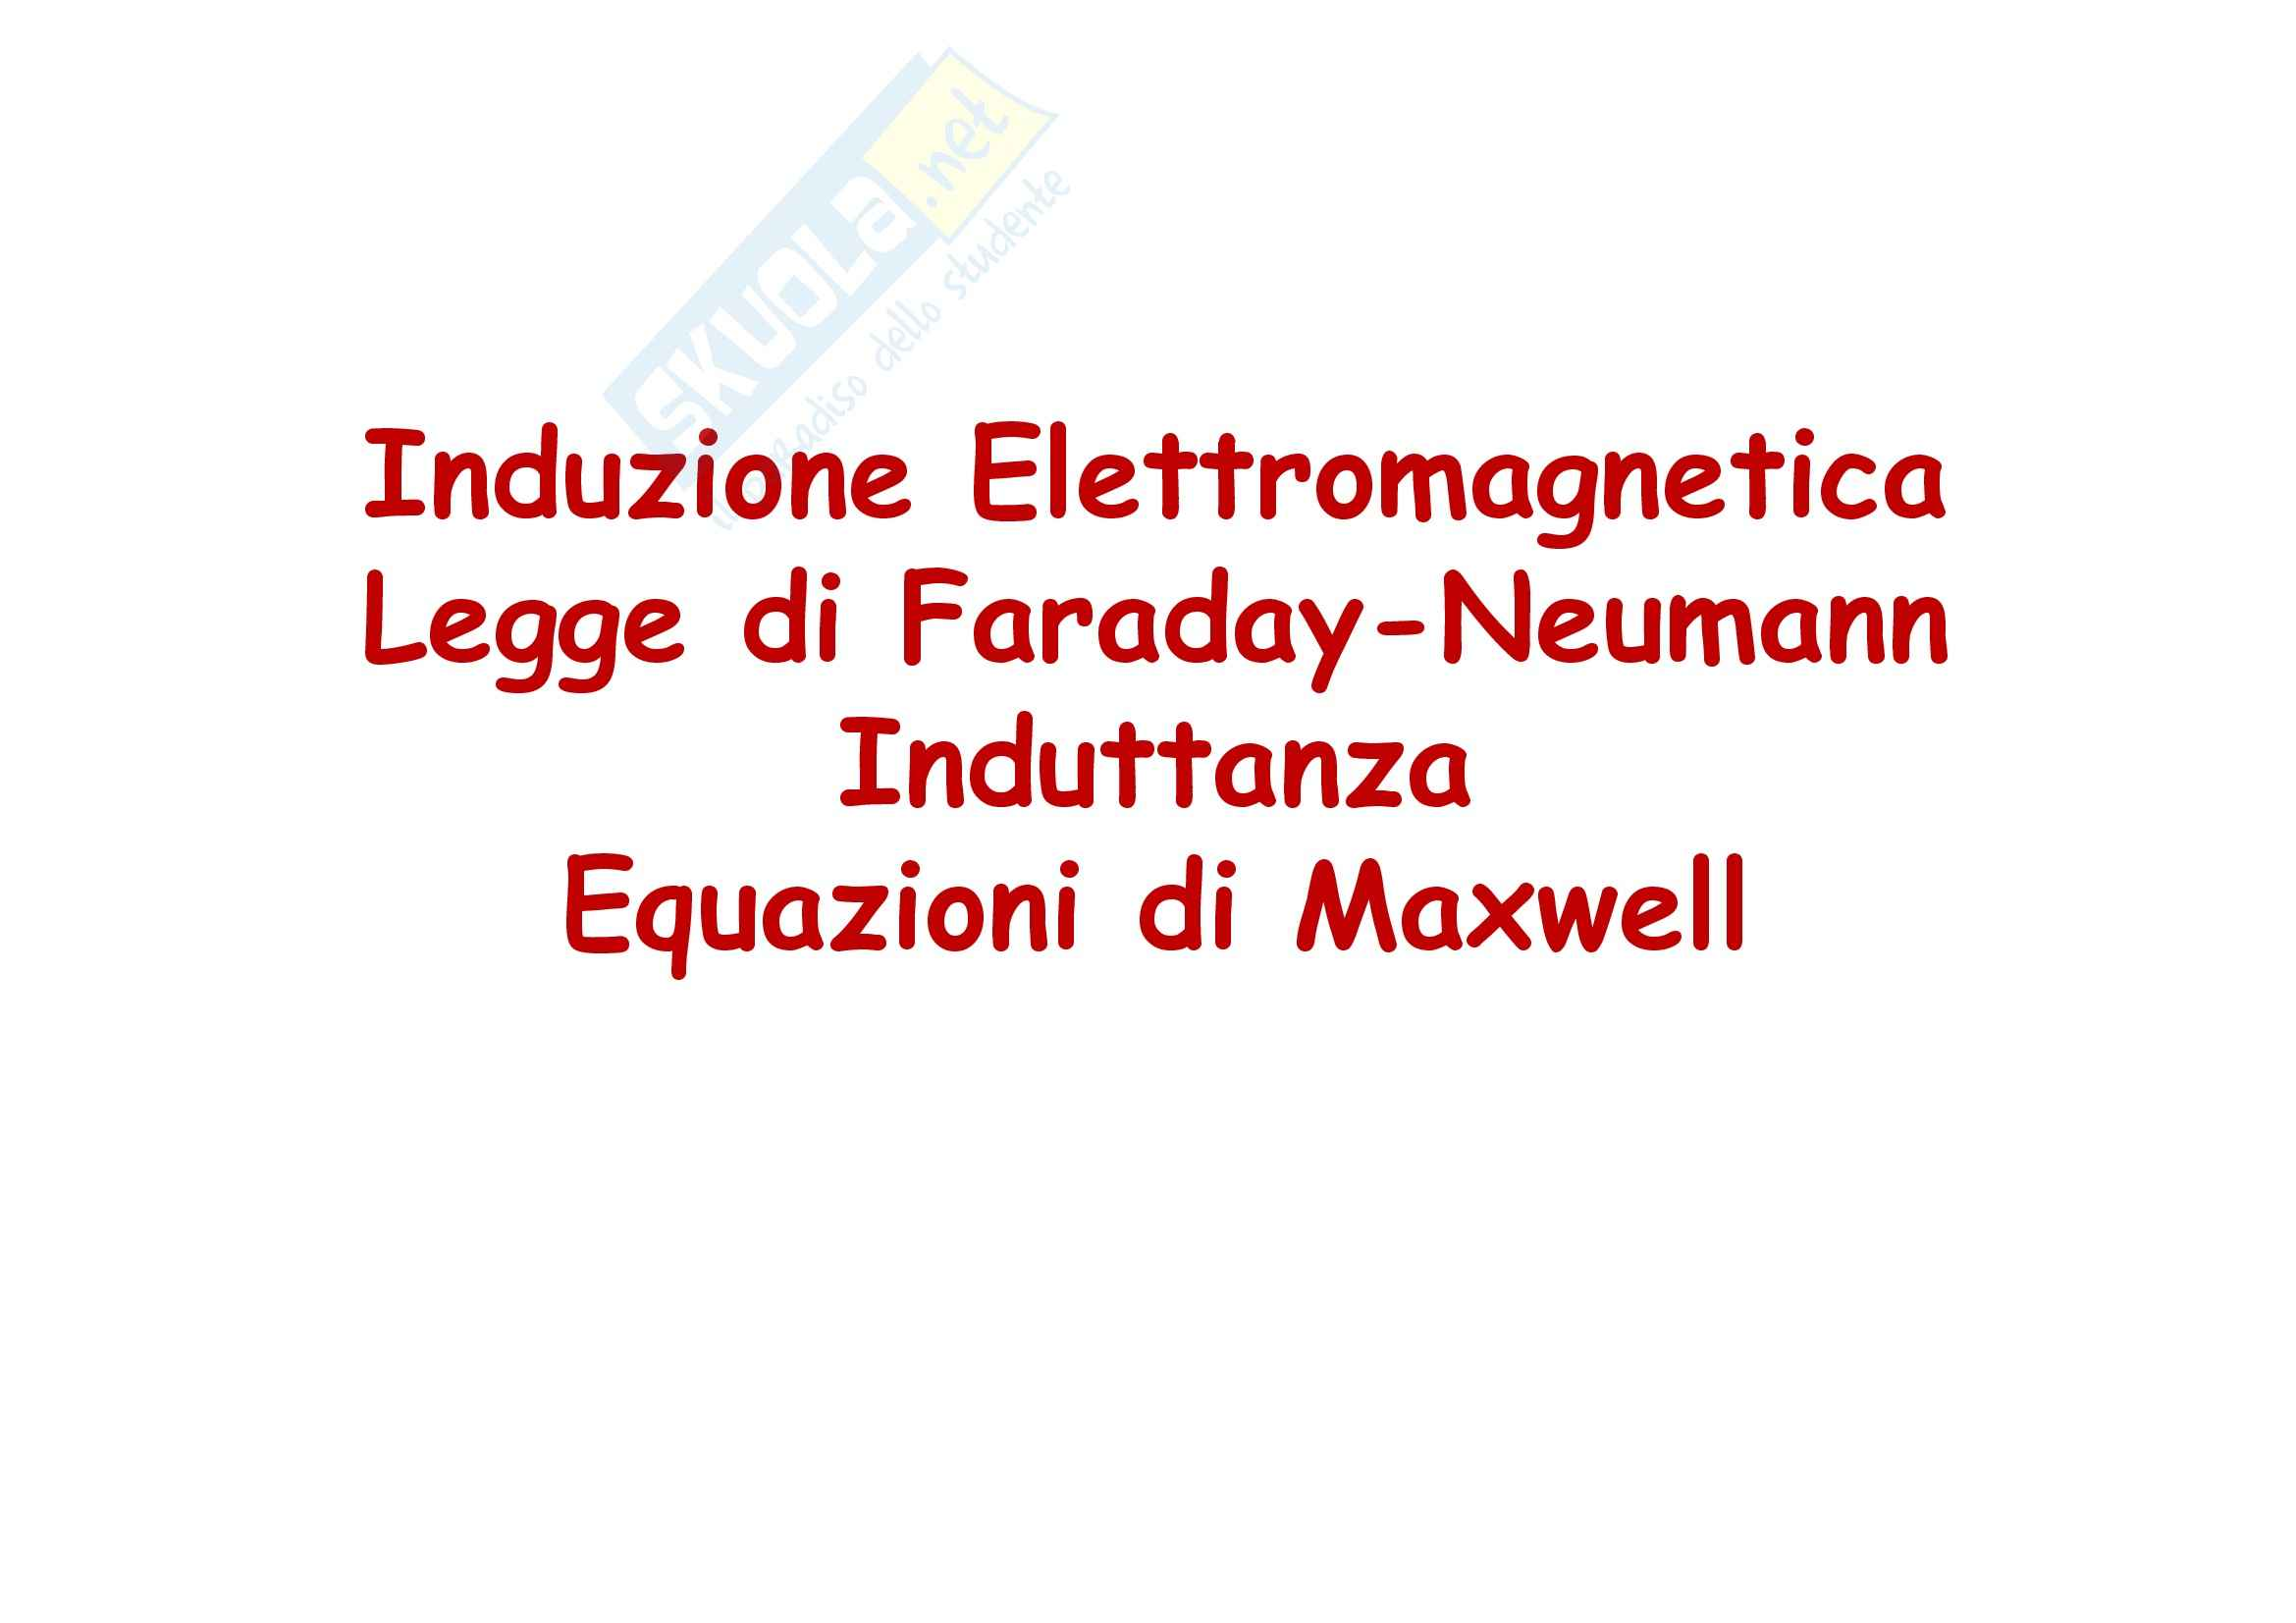 Fisica generale - l'induzione elettromagnetica e Legge di Faraday